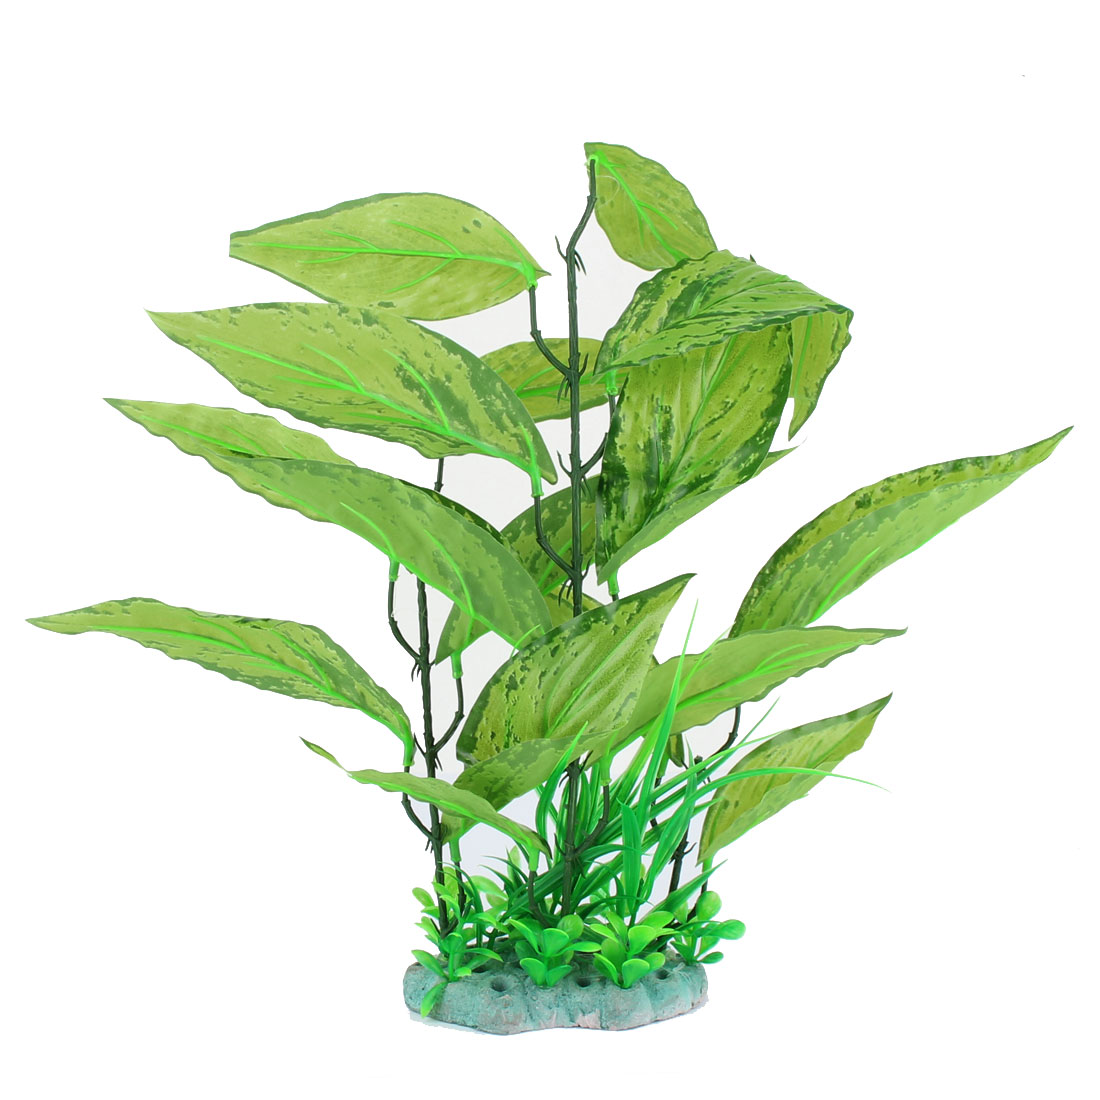 Aquarium Plastic Artificial Fake Water Plant Grass Decor Ornament Light Green